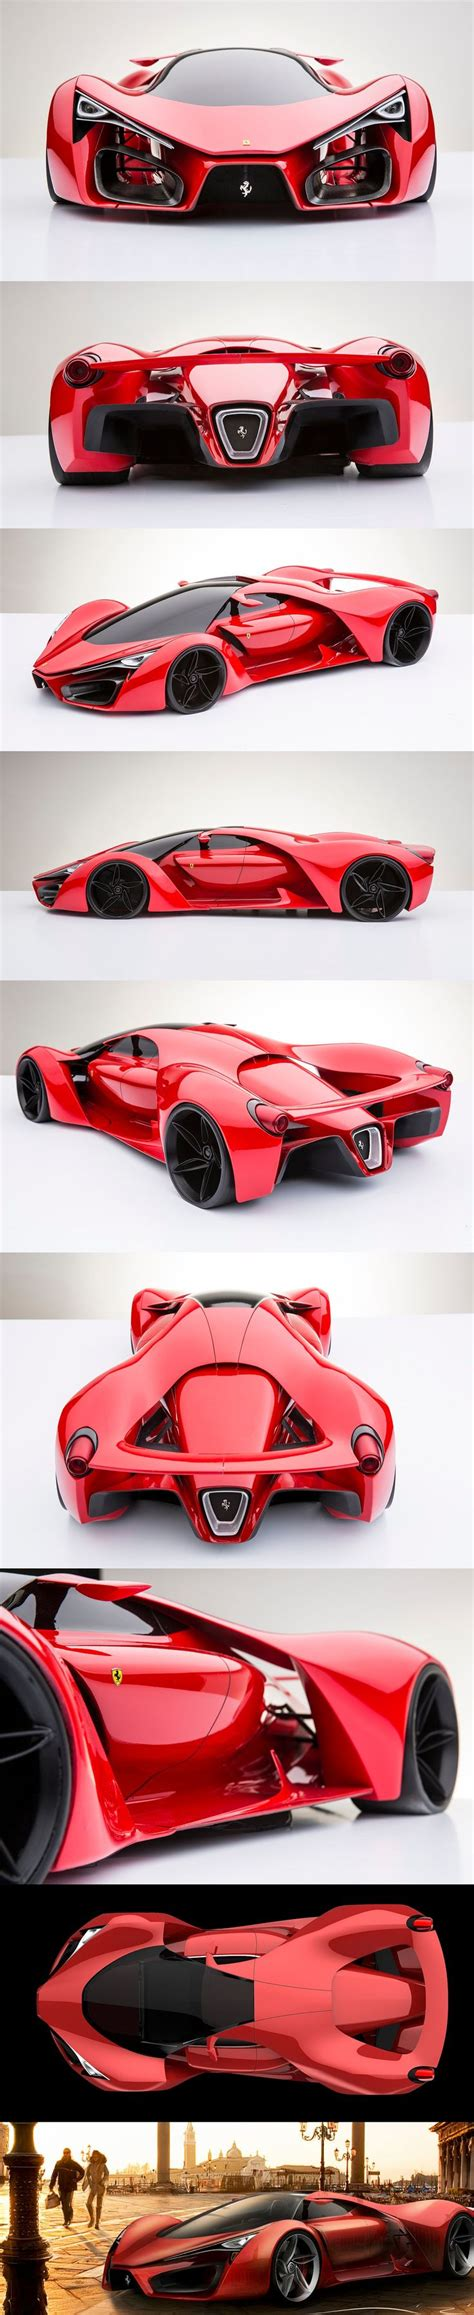 future ferrari supercar 10 images about vroom vroom cars on pinterest car